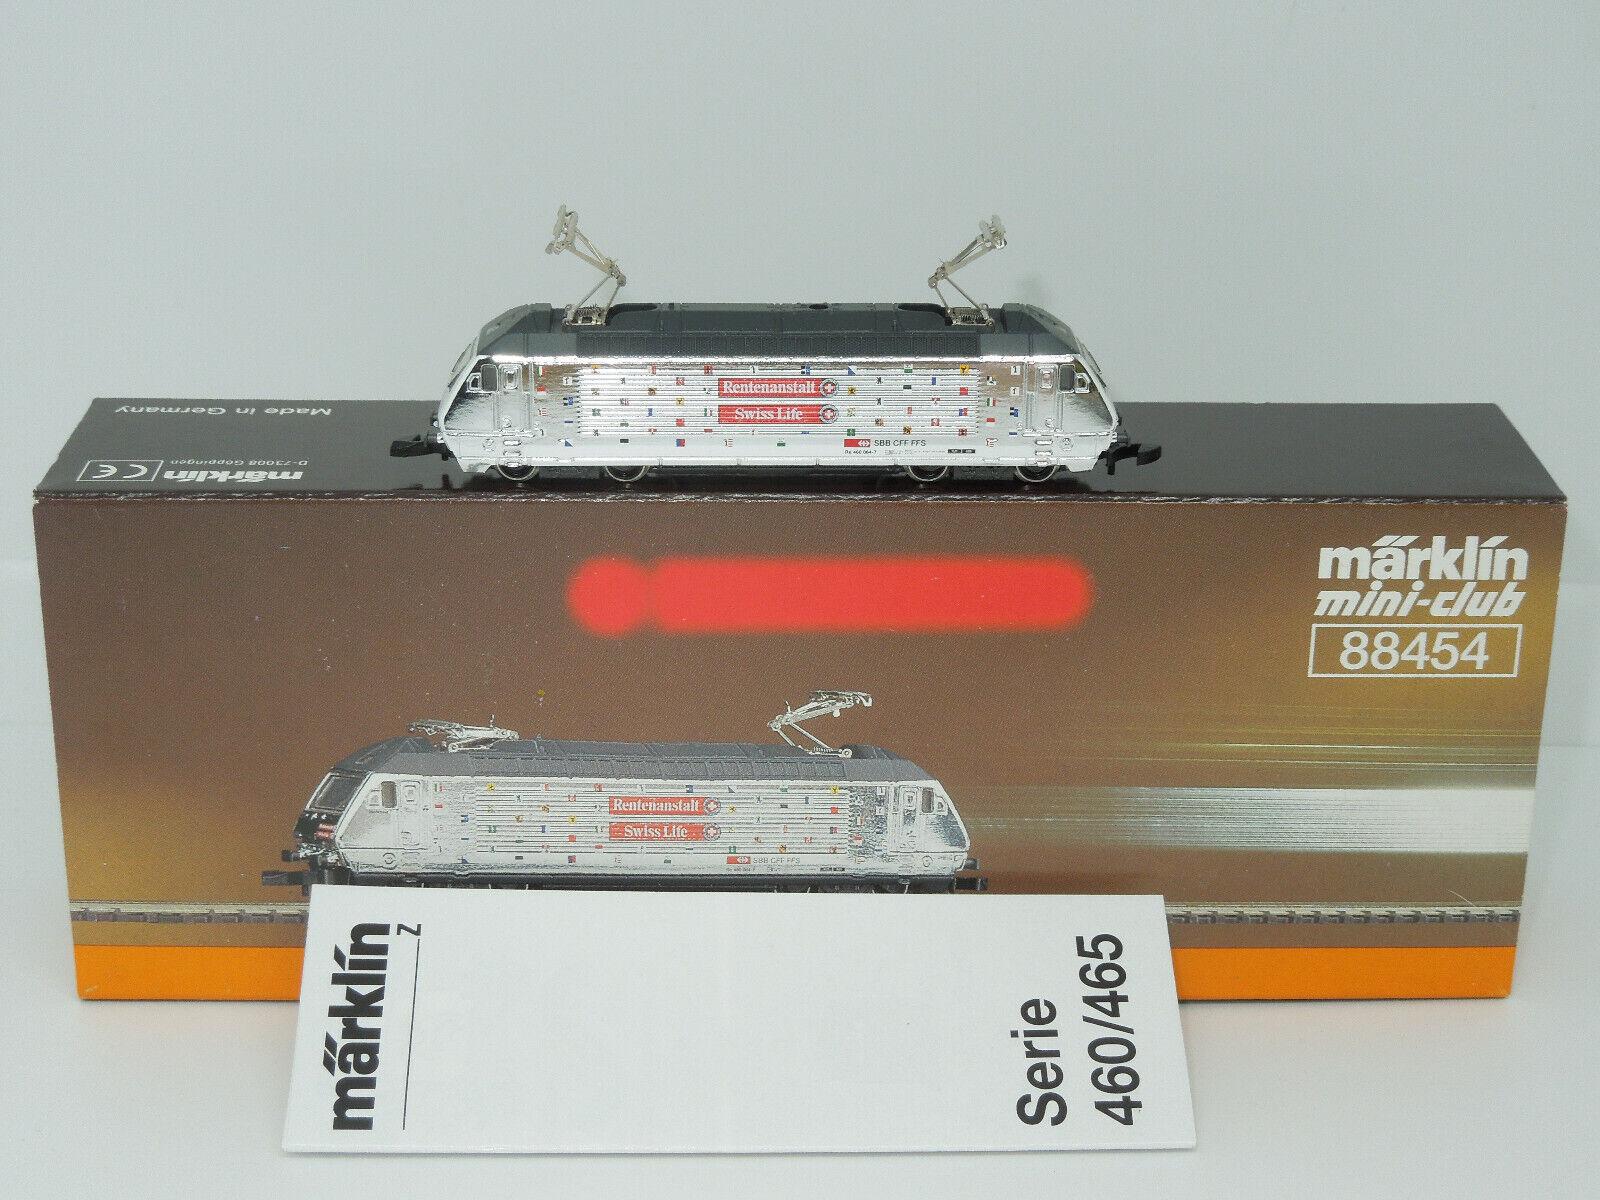 Märklin mini-club 88454 E-Lok serie 460 della SBB-pensioni manicomio Swiss Life